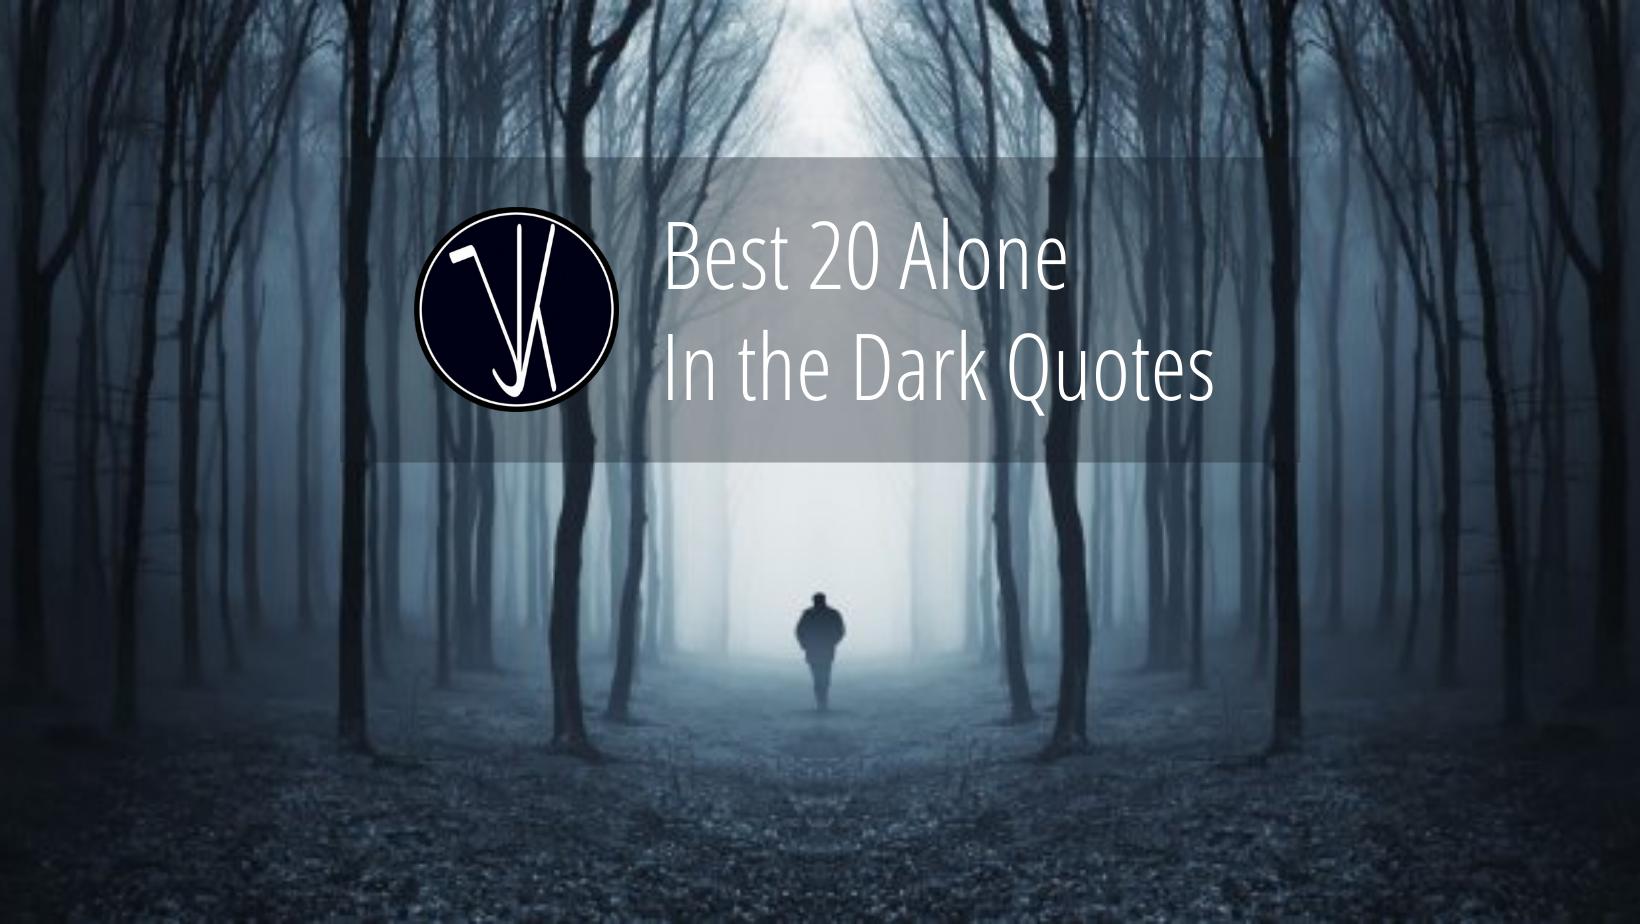 alone in the dark quotes